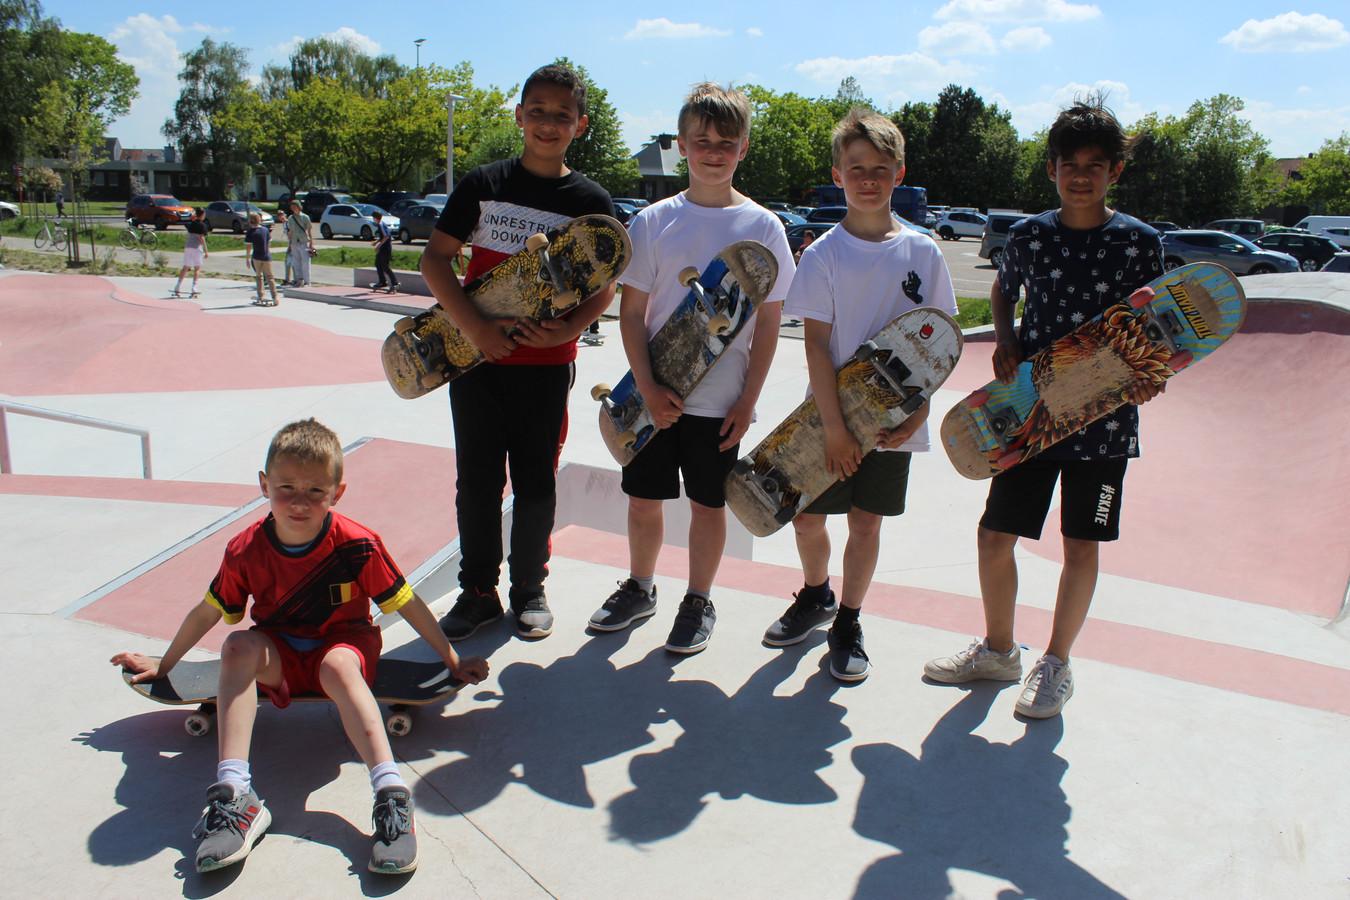 Zaterdagnamiddag zaten er vooral jongere skaters in Eeklo. Tegen de avond komen de wat oudere skaters.